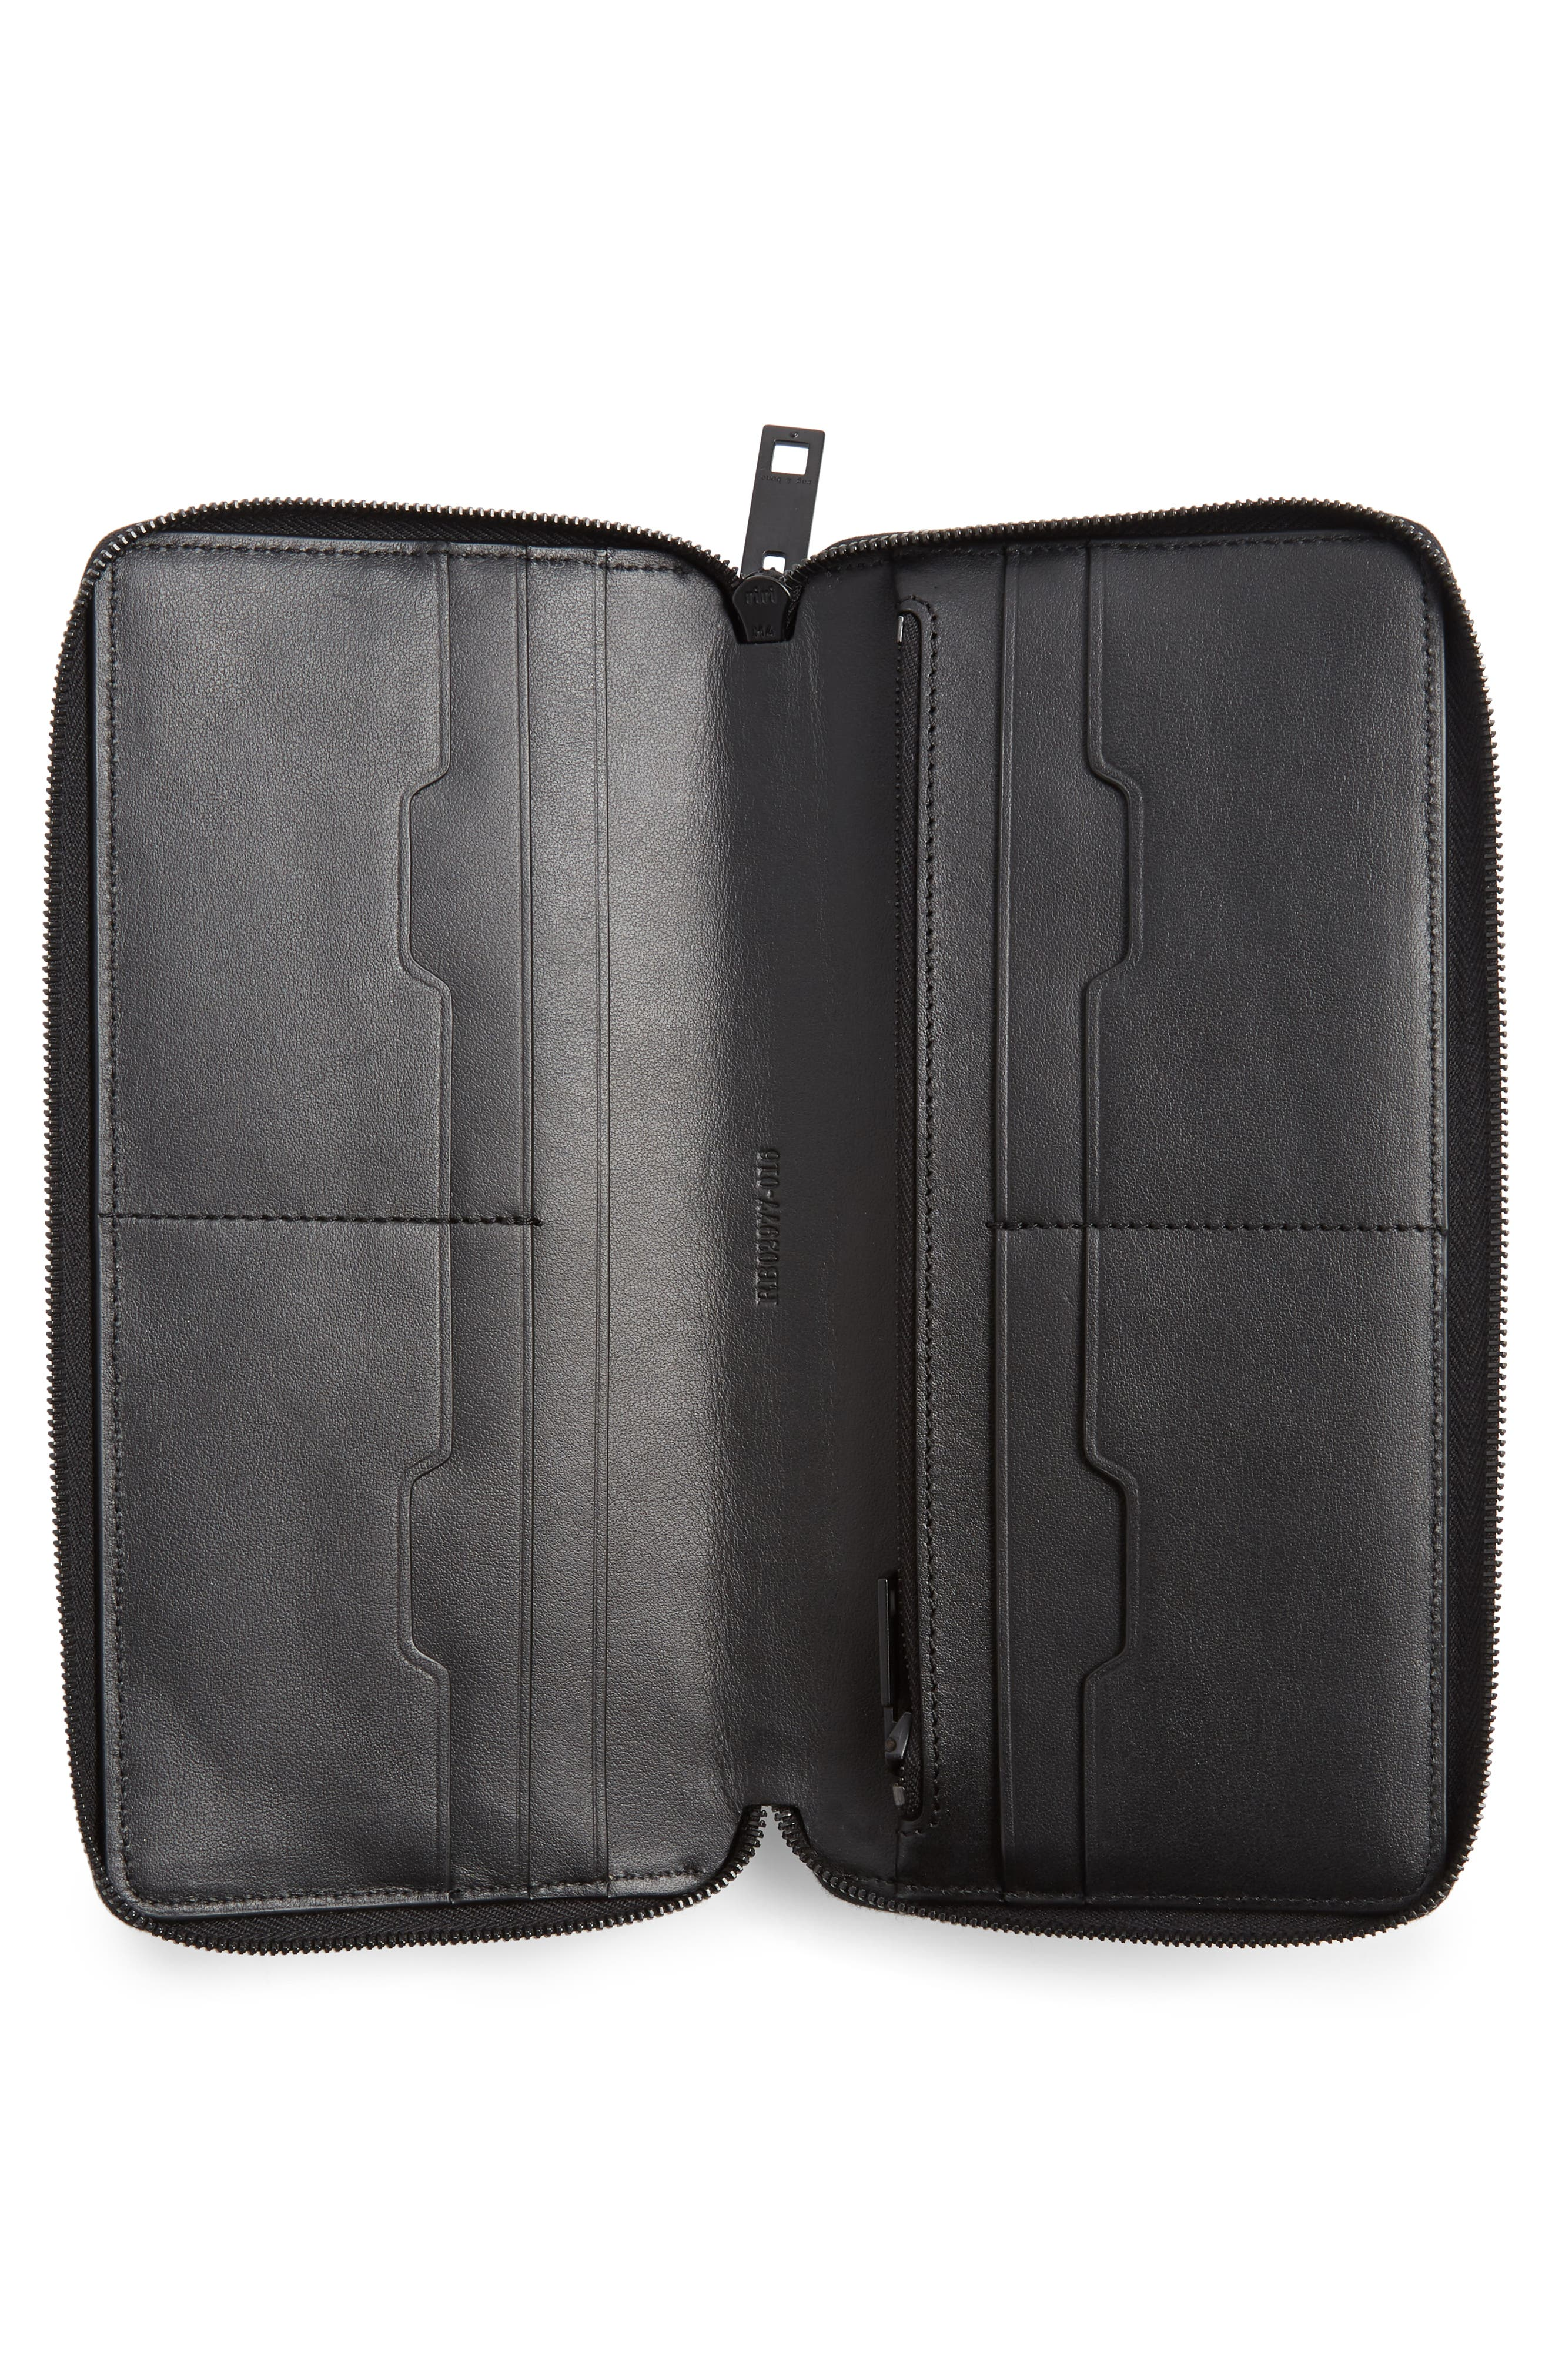 Croc Metallic Lambskin Leather Wallet,                             Alternate thumbnail 4, color,